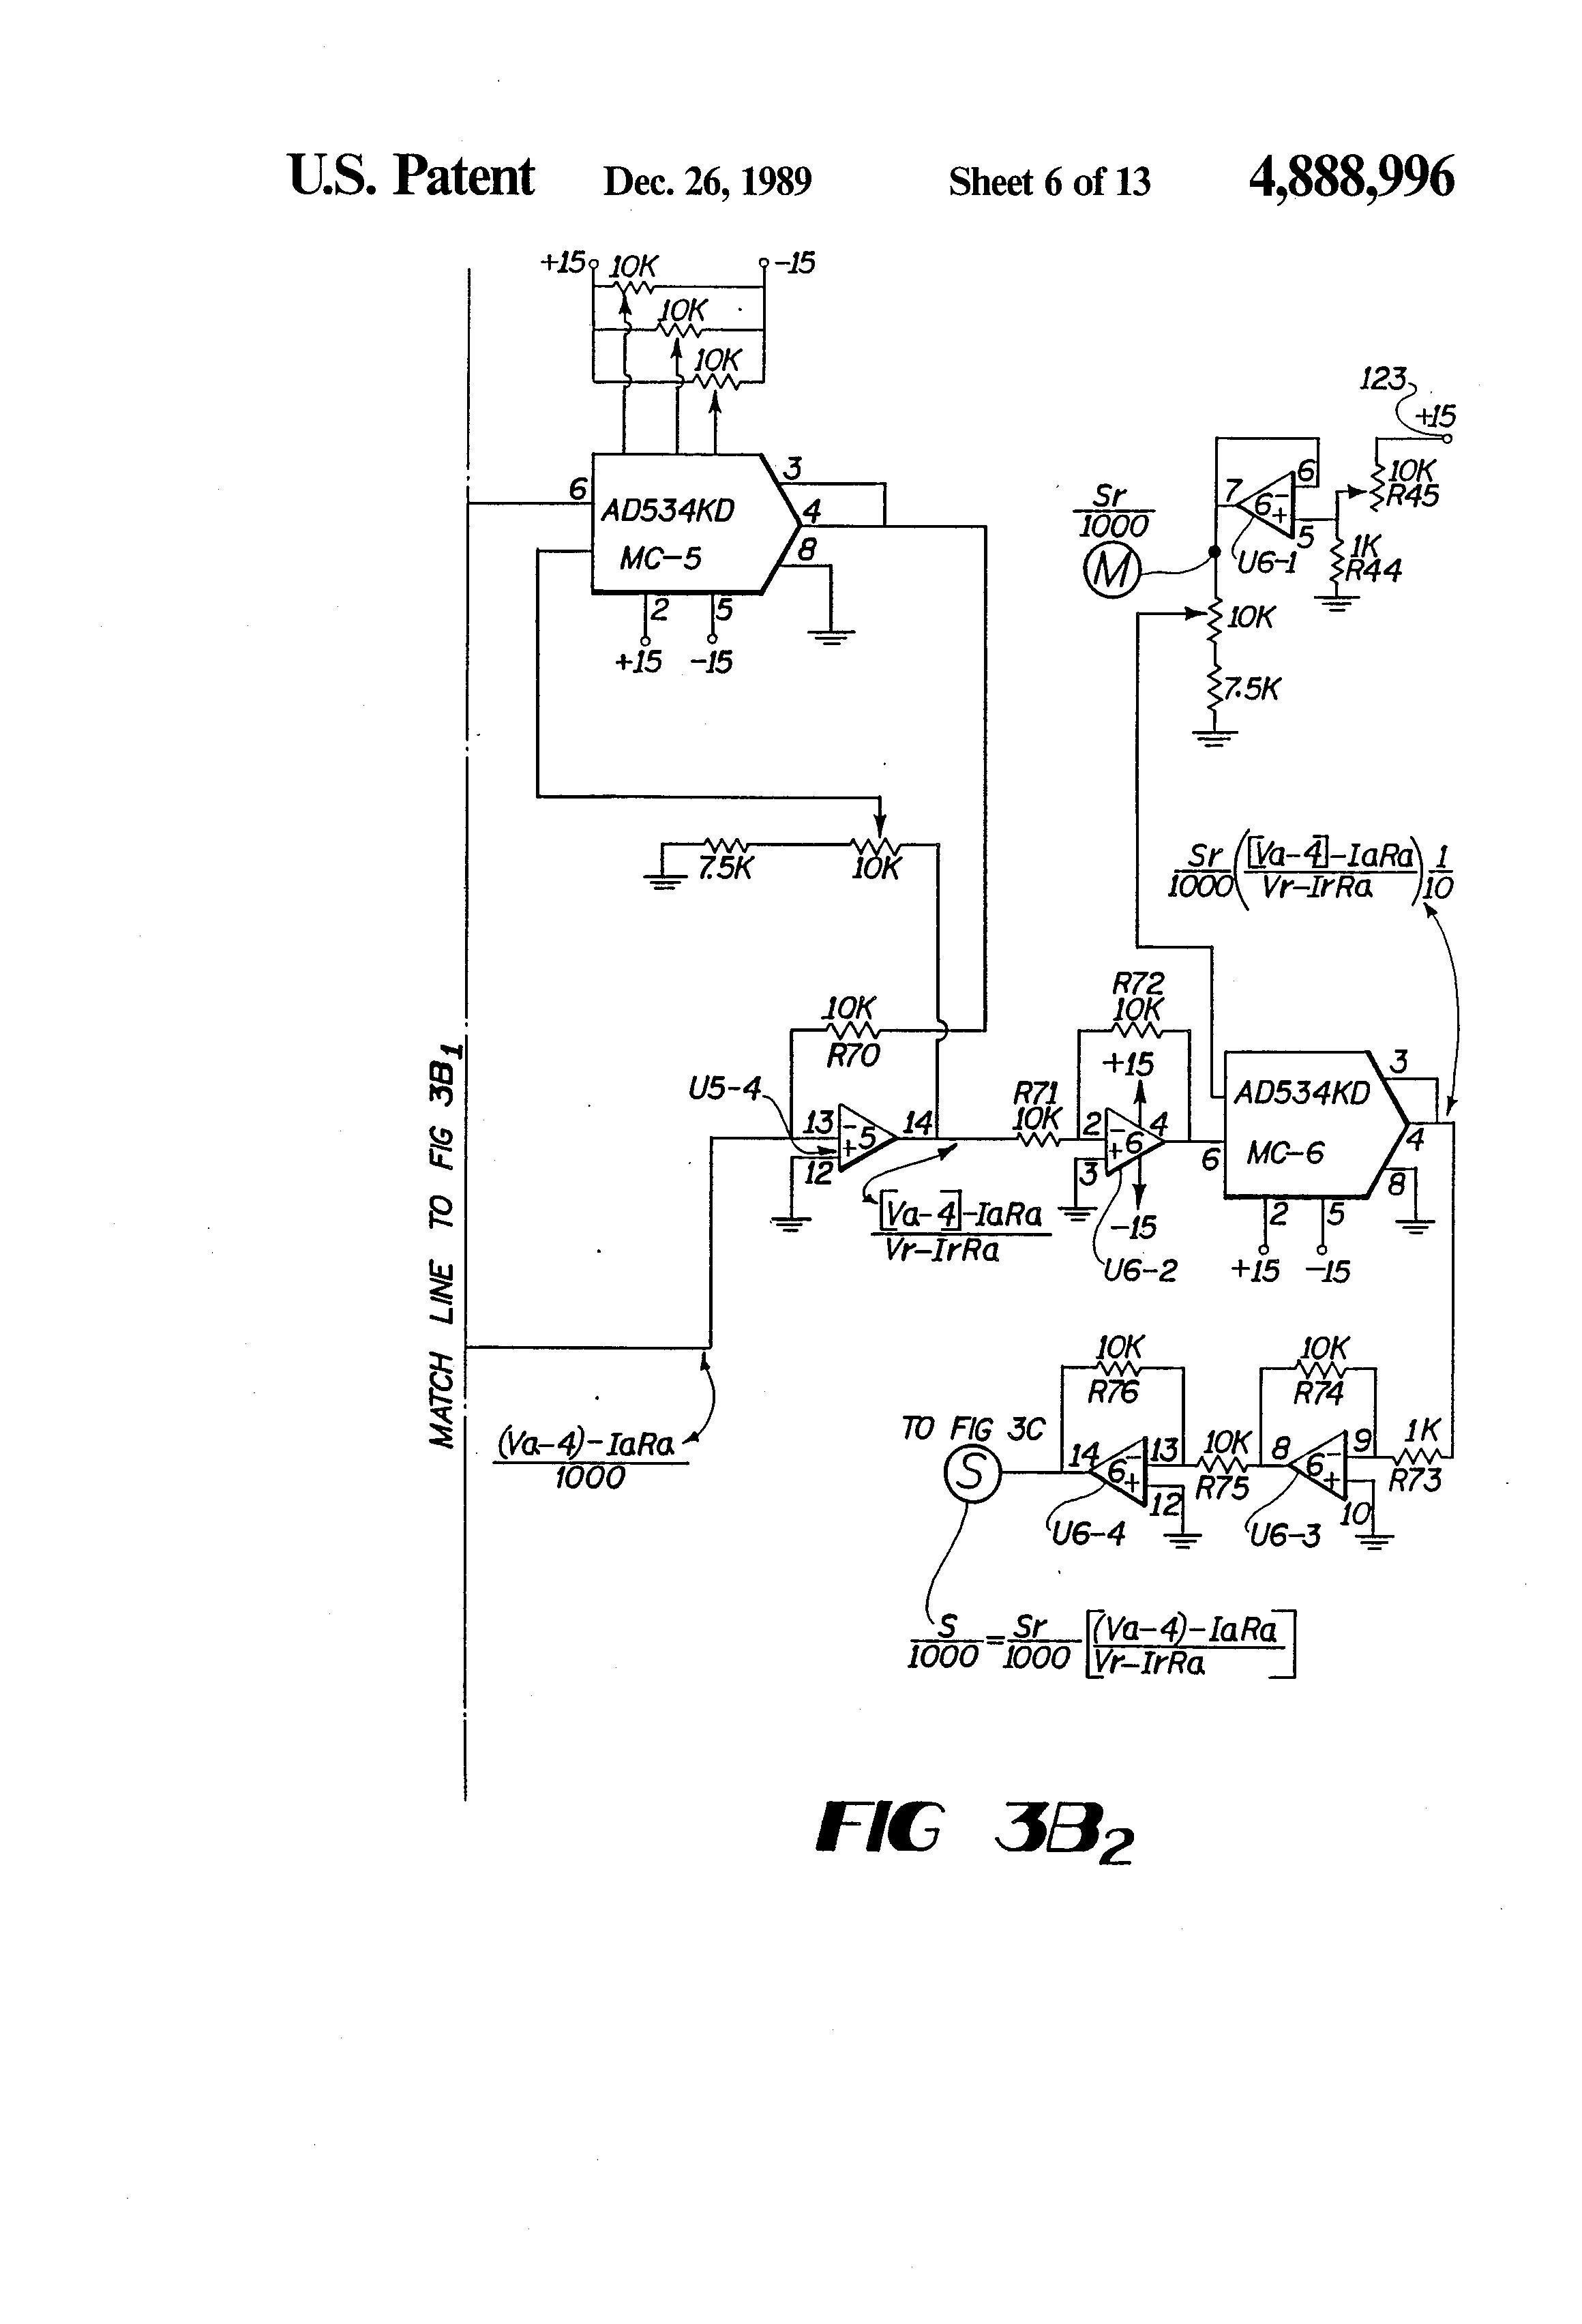 2601ag2 wiring schematic wiring diagrams u2022 rh autonomia co 220 Switch Wiring Diagram Dayton Drum Switch Wiring Diagram